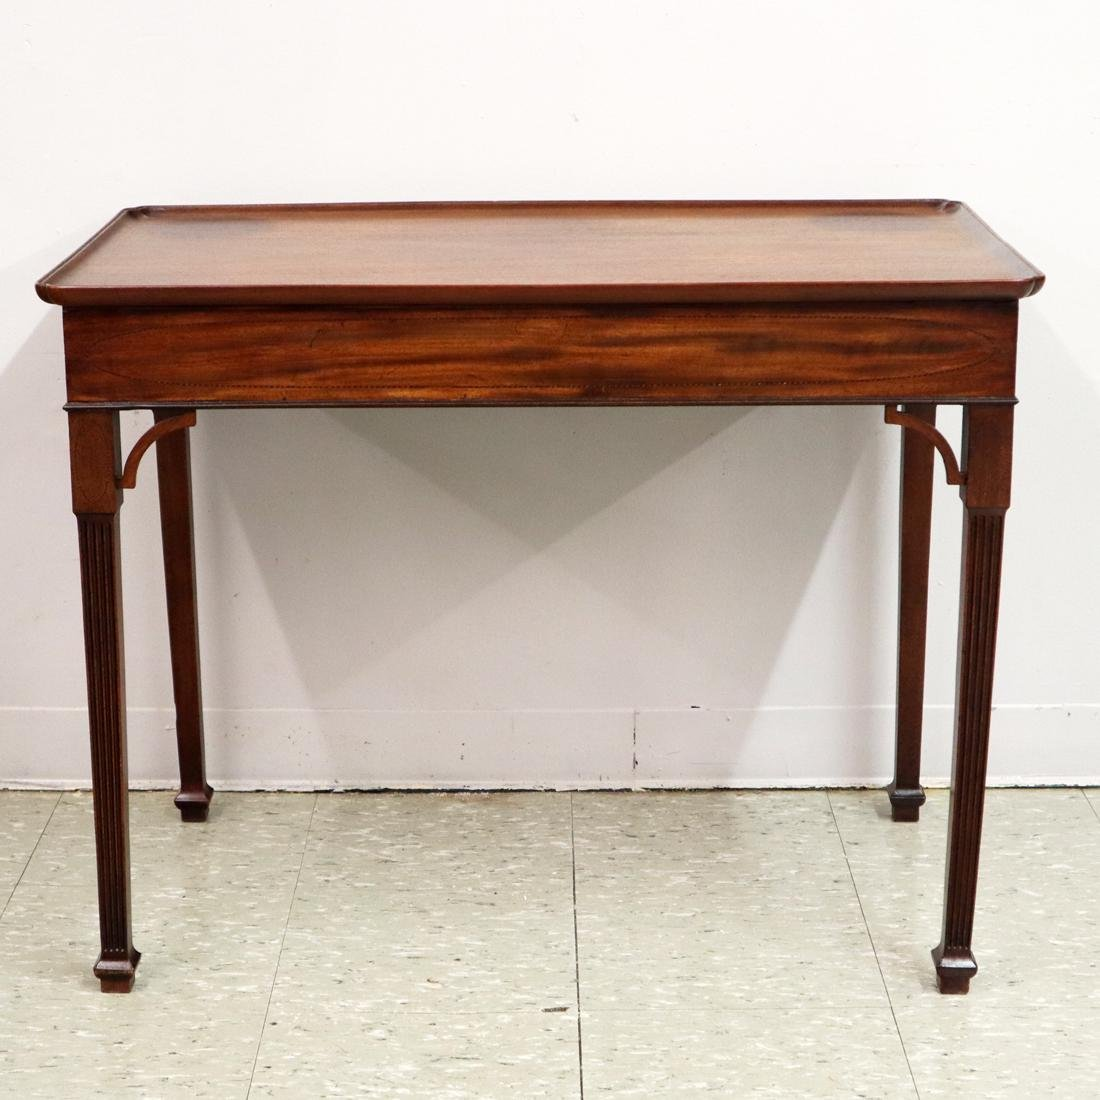 George III Silver Table